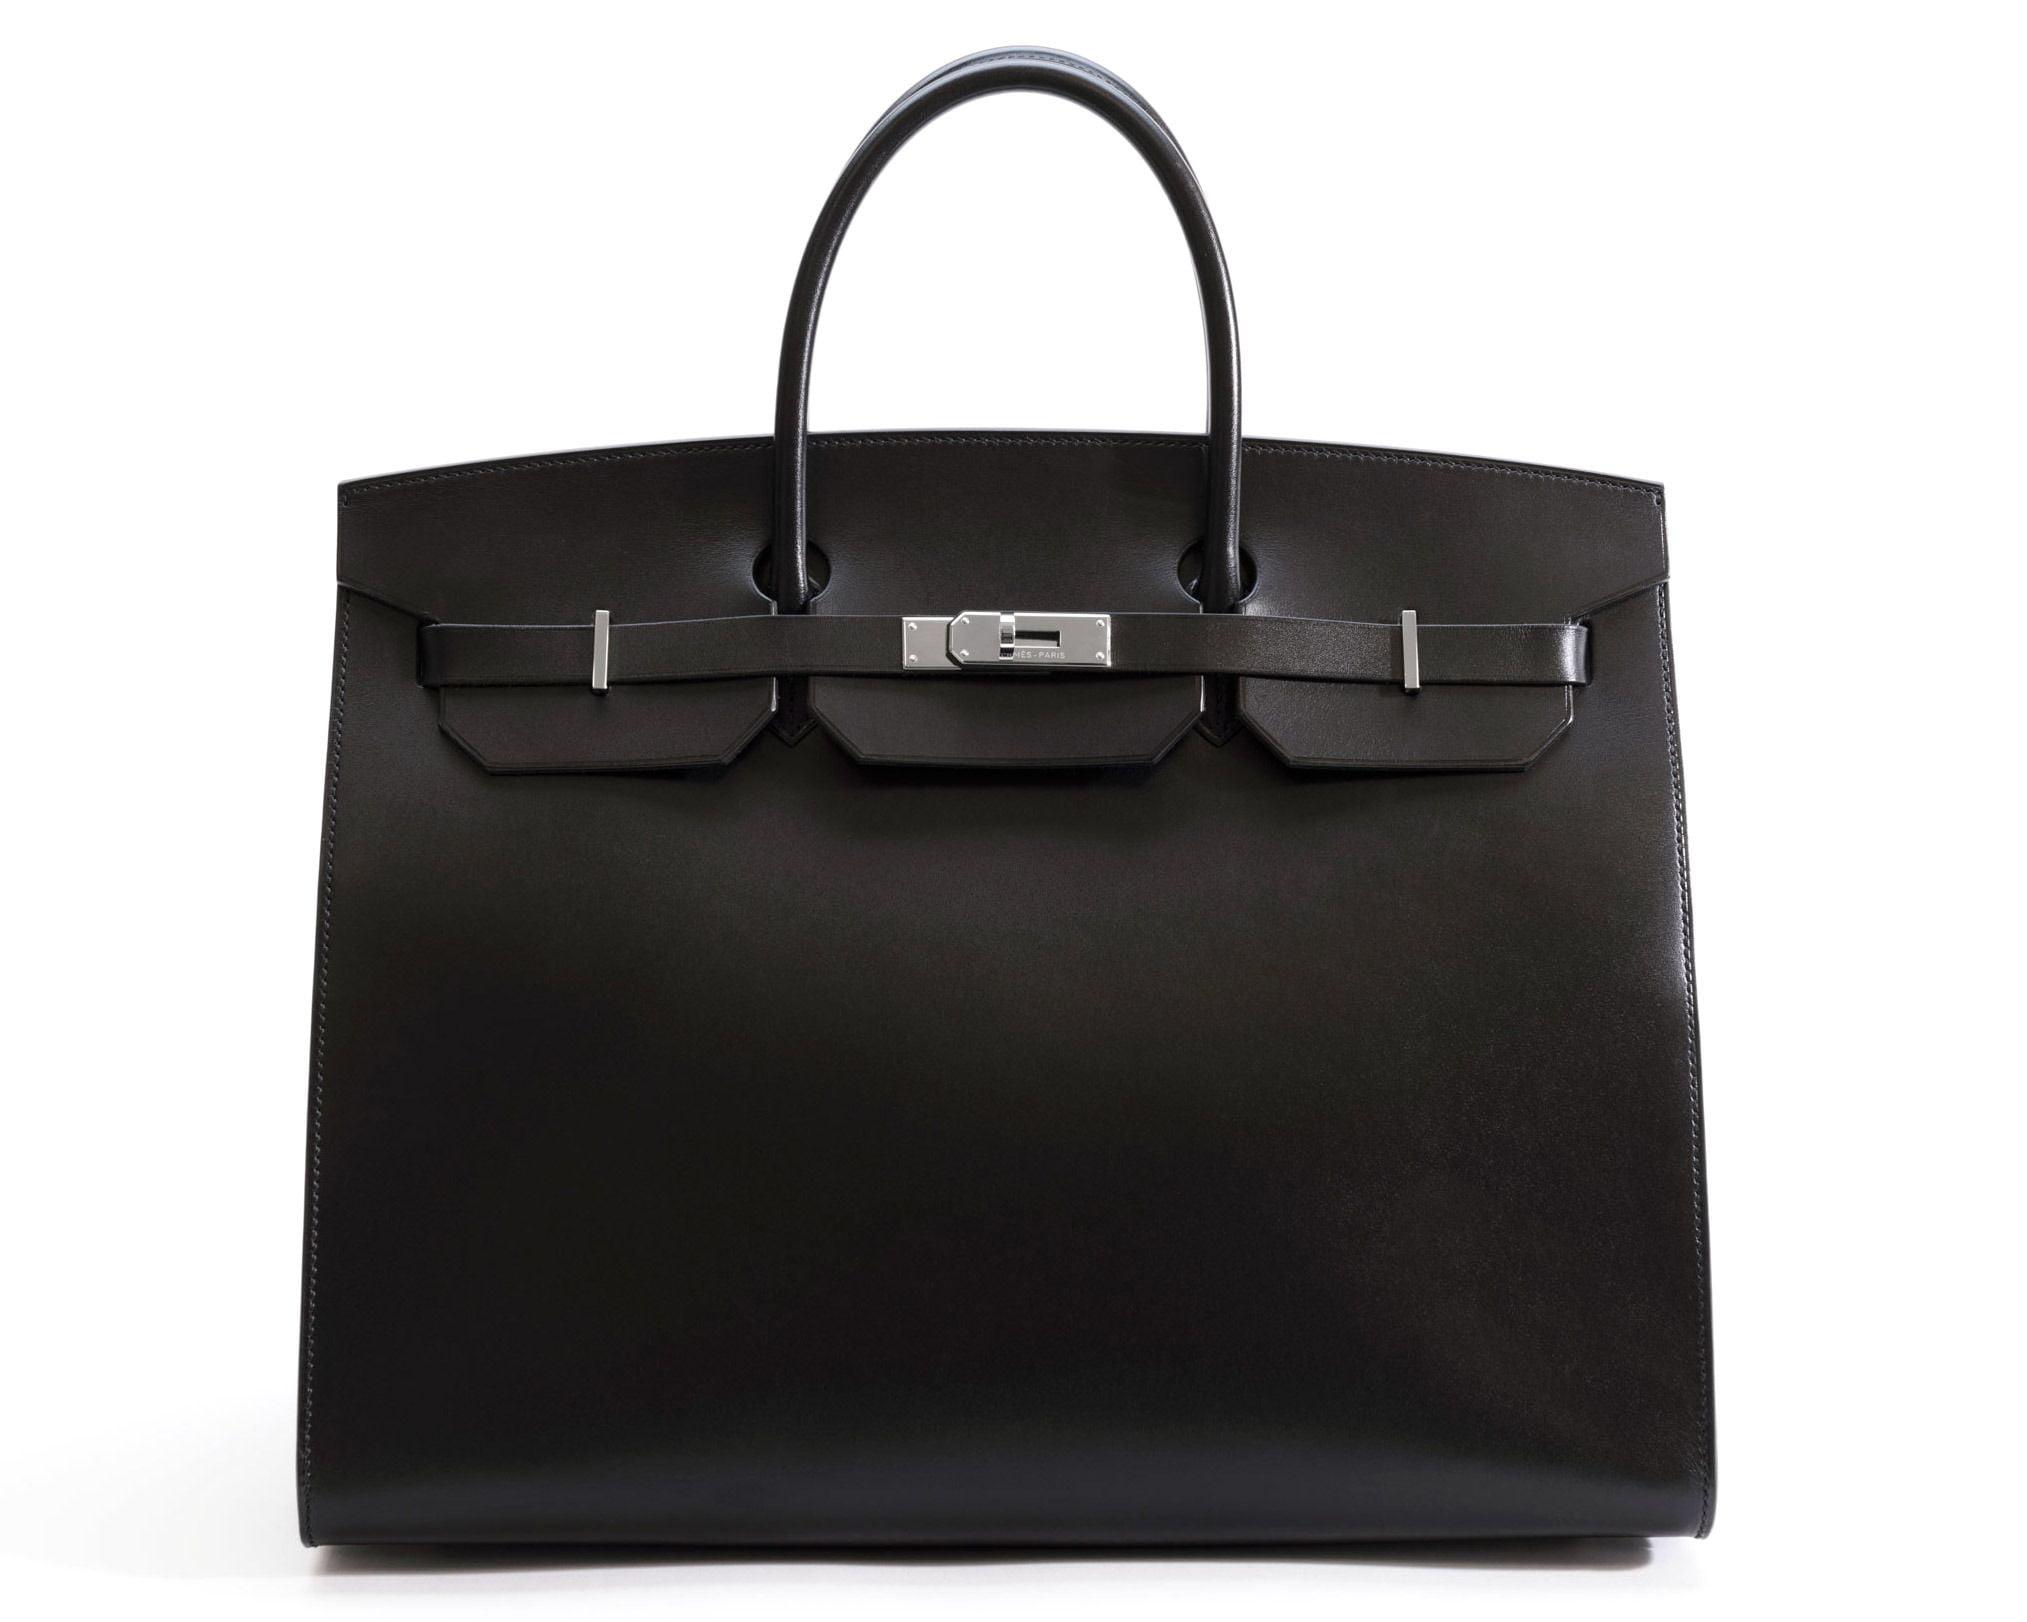 birkin crocodile bag - The Hermes Birkin Review - PurseBop